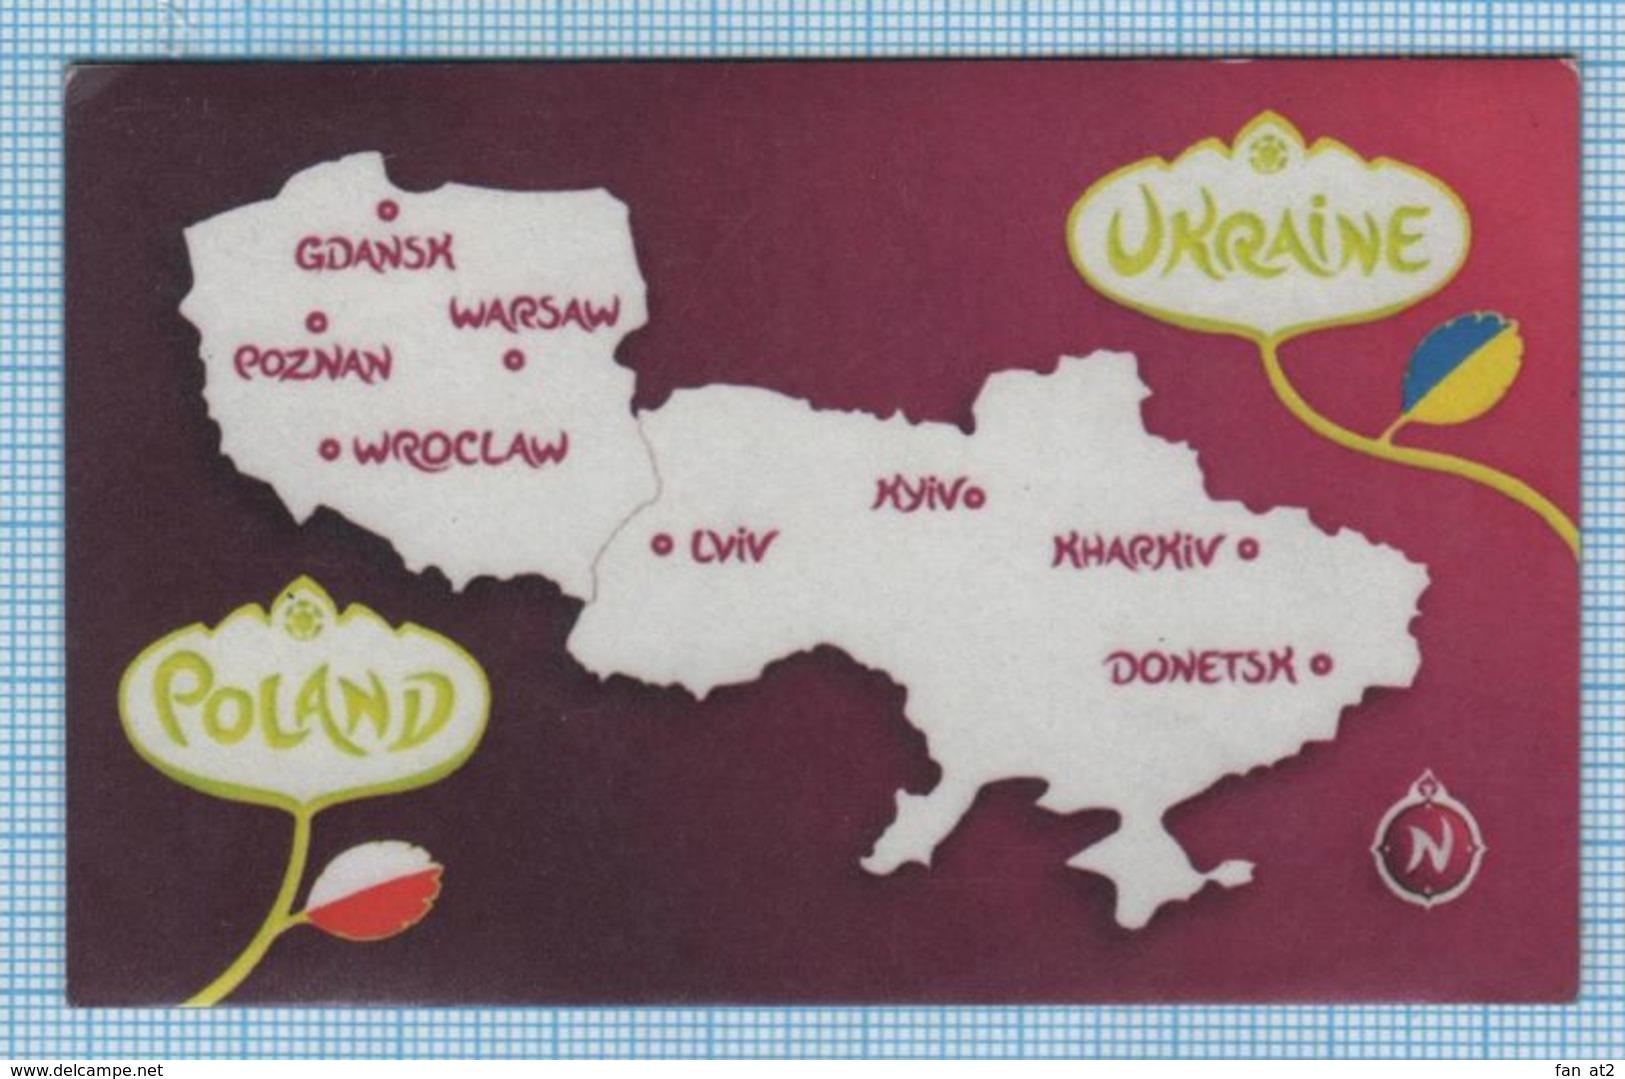 UKRAINE / Flexible Magnet / Football UEFA Europe Championship. EURO 2012 Poland. Polska. Sports Stadiums. - Sports